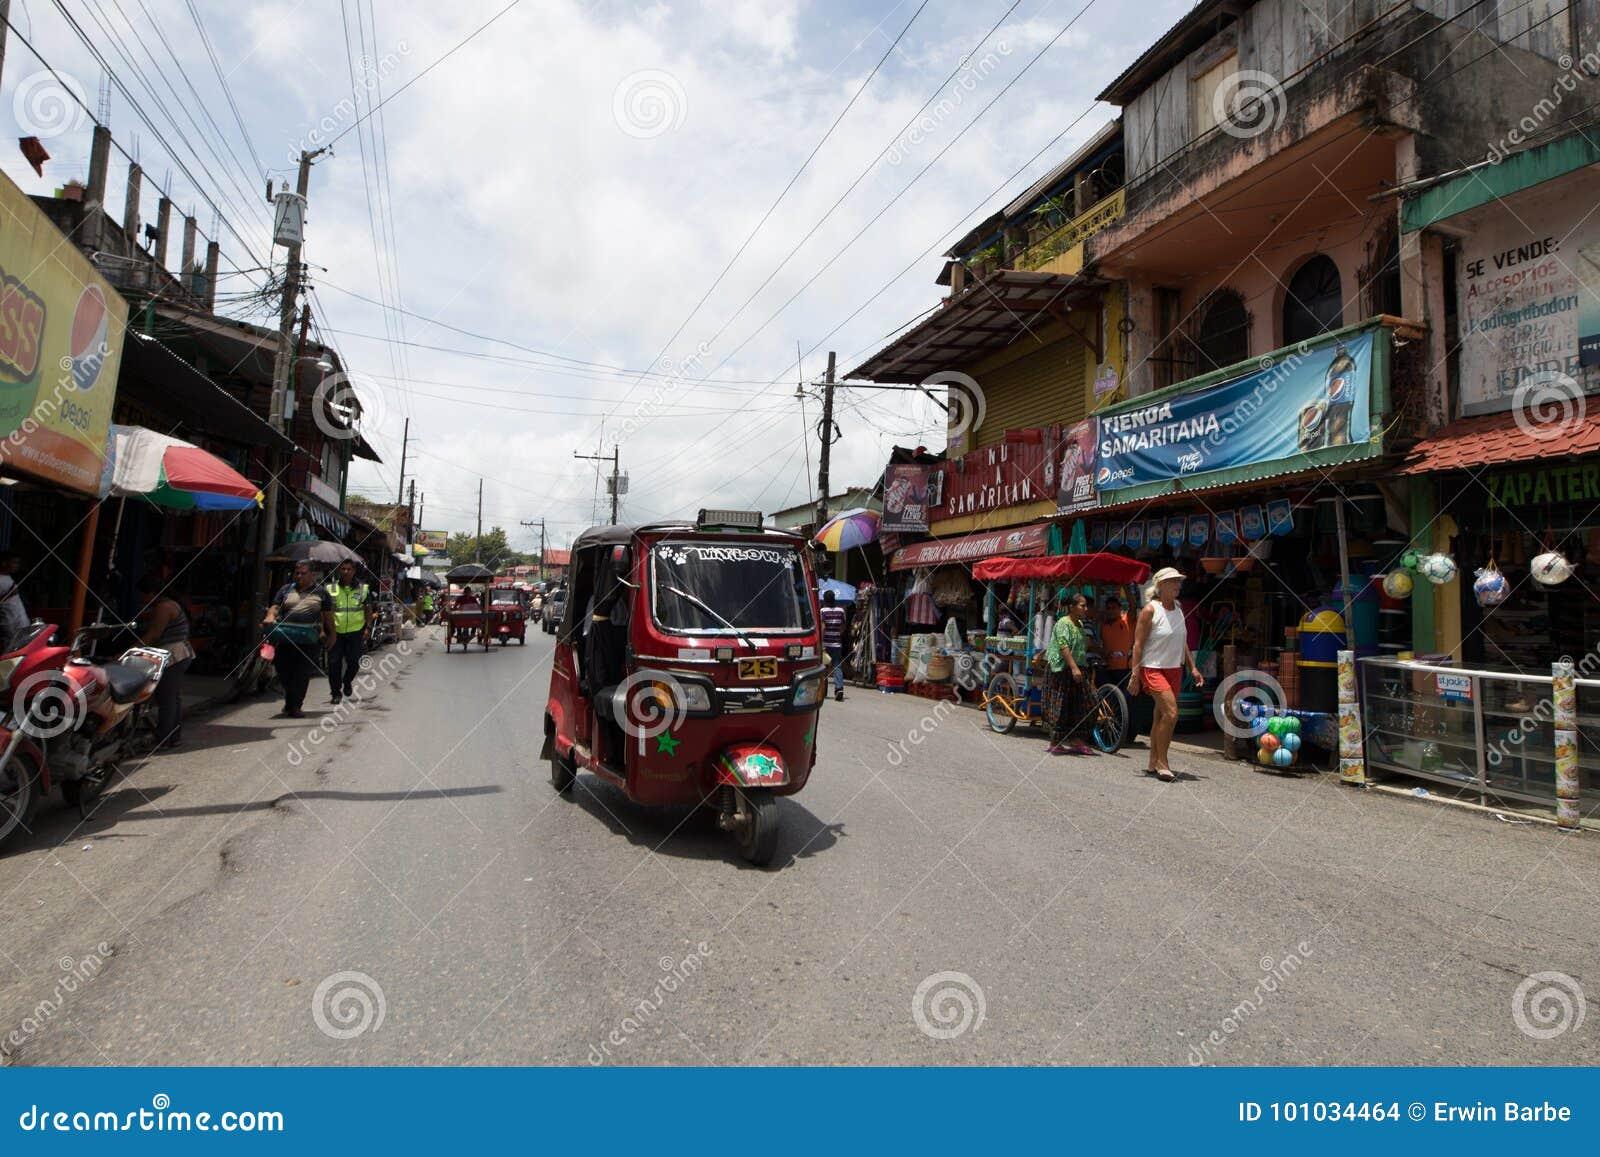 Tuktuk in Guatemala